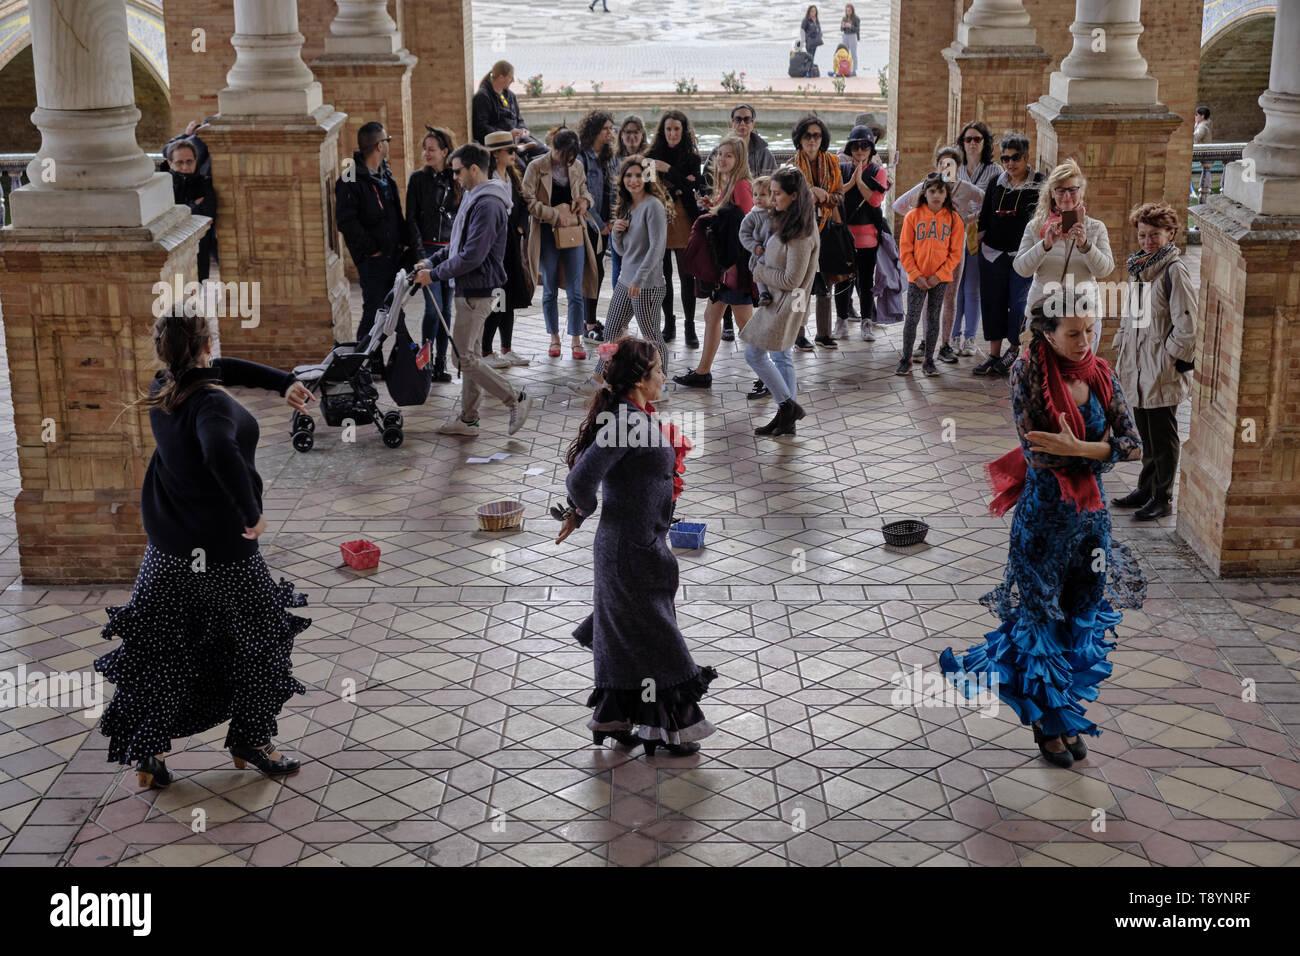 April 2019 - traditional spanish street falmenco dancer at the main square Plaza de Espana in Andalisia Seville Spain - Stock Image